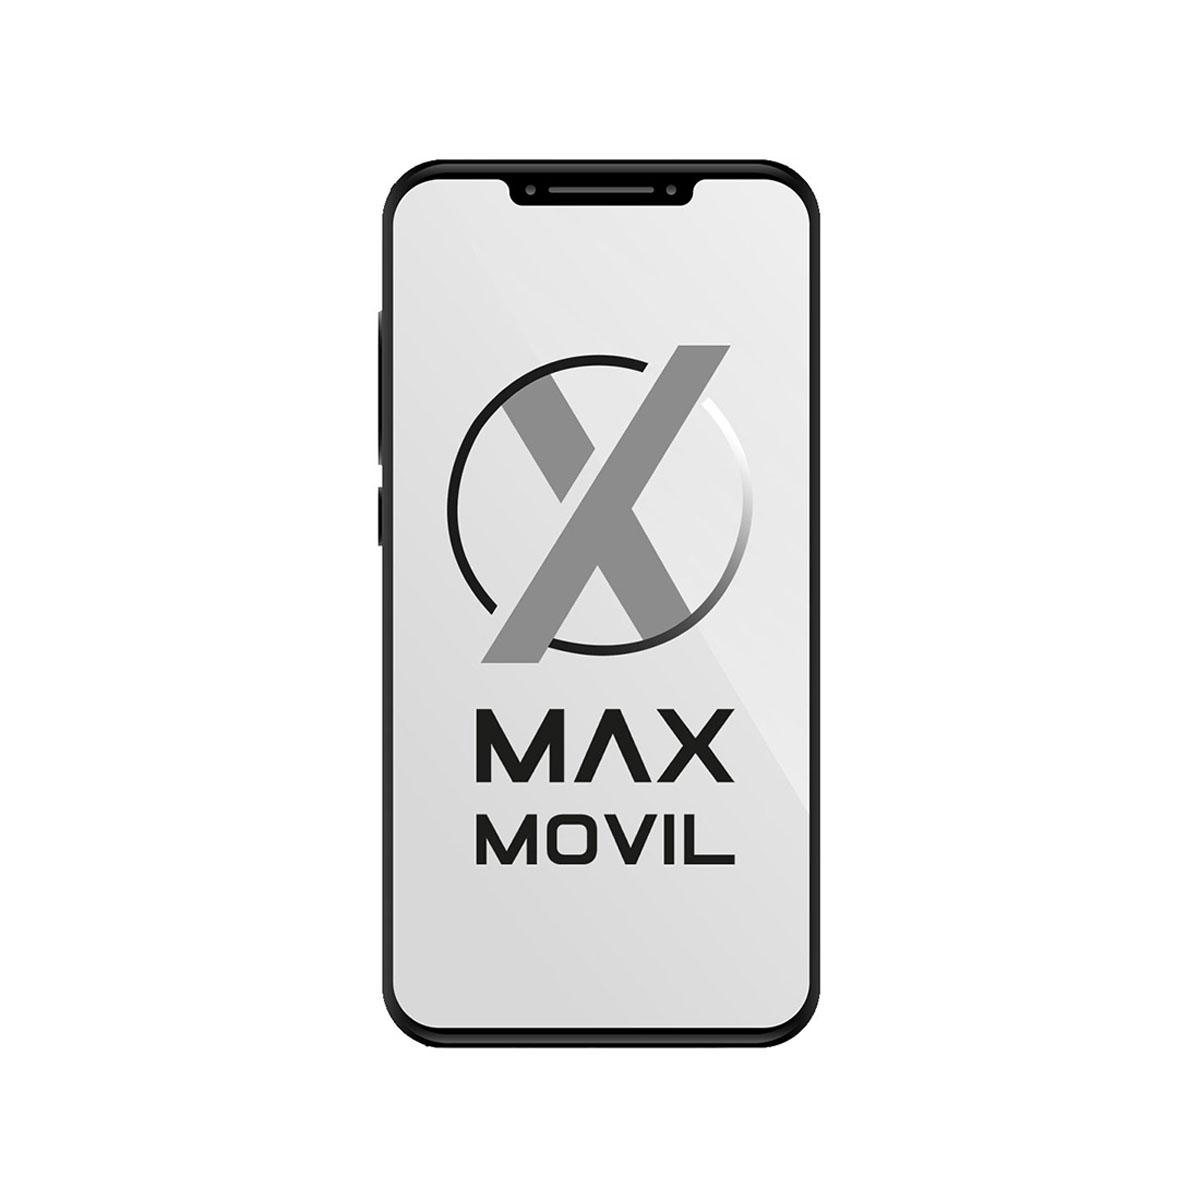 Carcasa trasera transparente para Xiaomi Mi A2 Lite